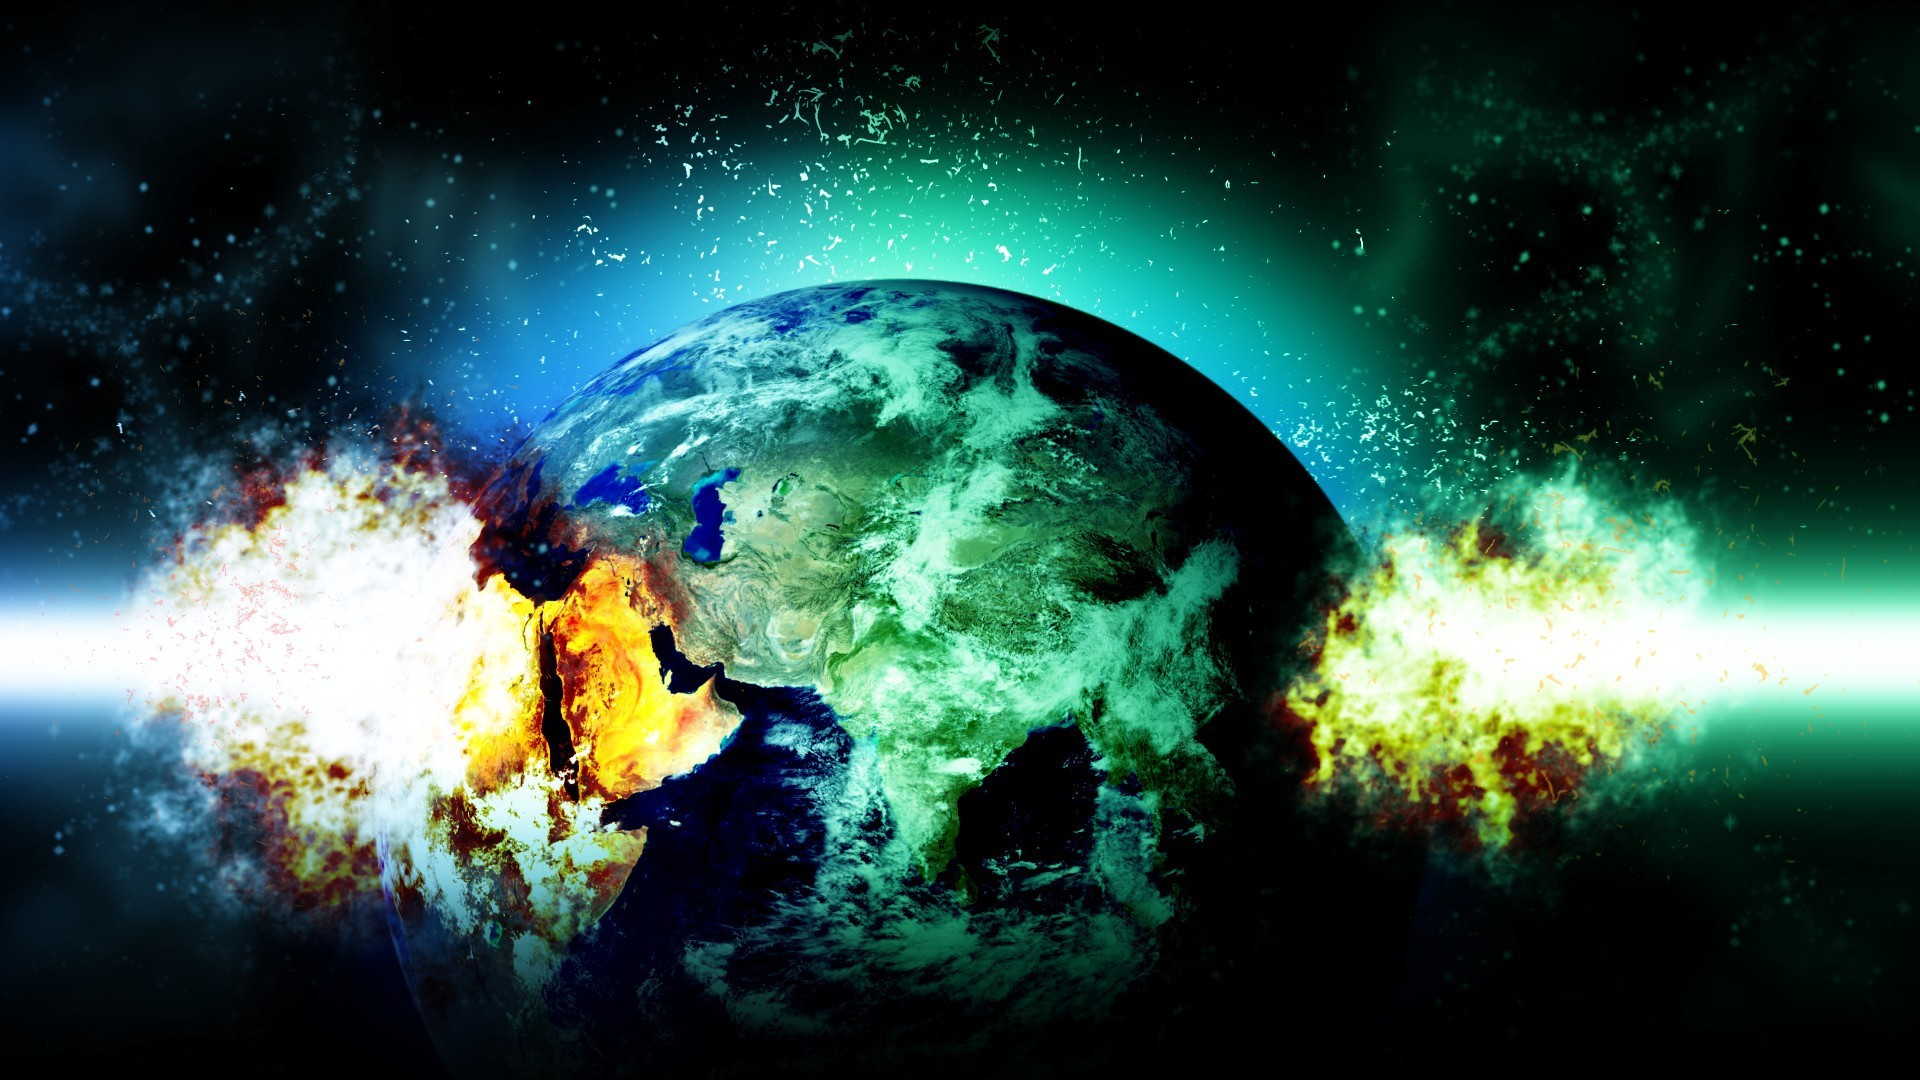 Res: 1920x1080, planet explosion Wallpaper 8 - 1920 X 1080